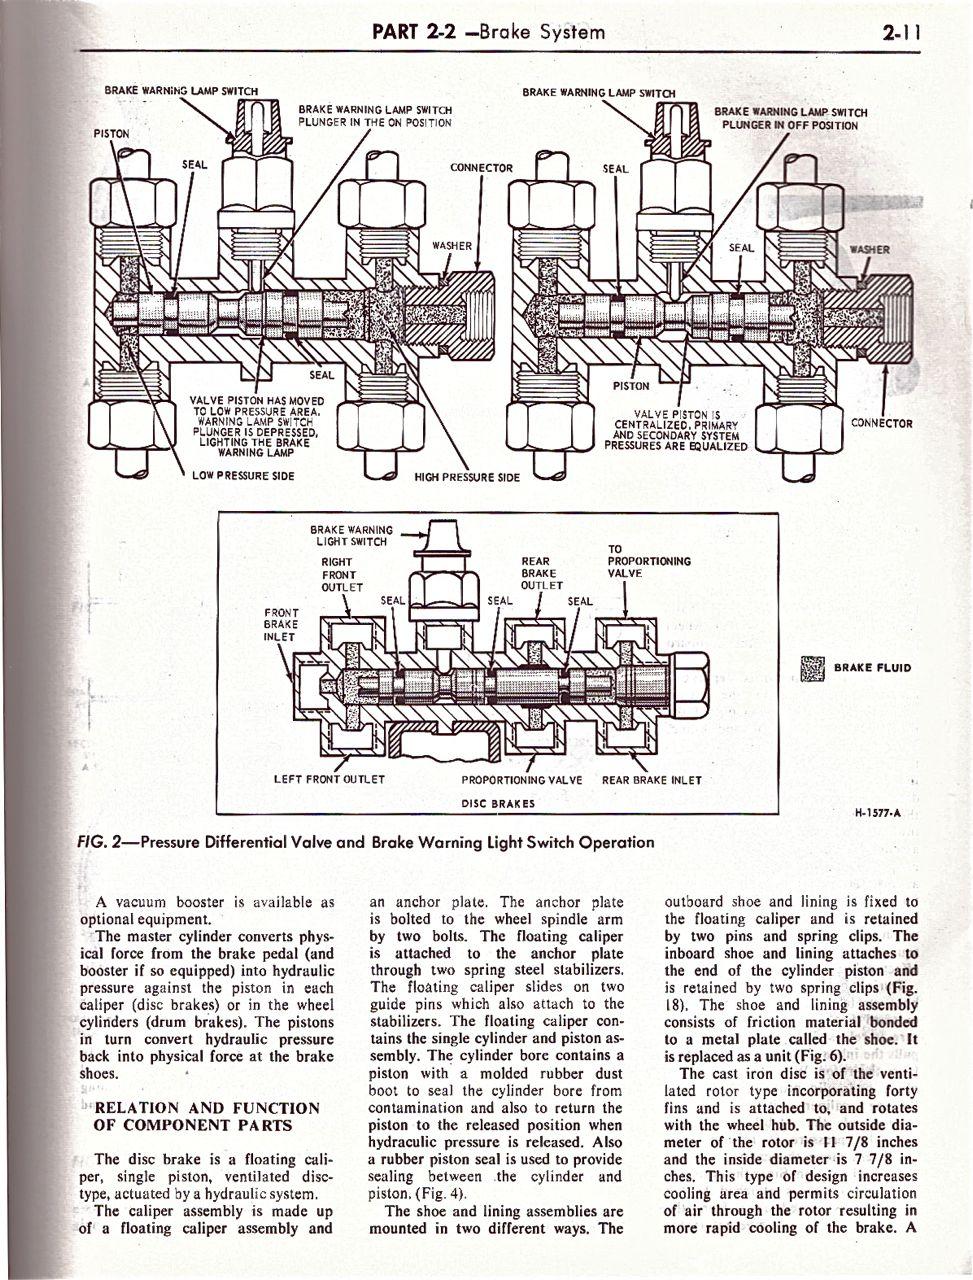 agalaxieworks.com_sites_forum_pics_1968_LTD_Brakes_Proportioning_Valve_01.jpg